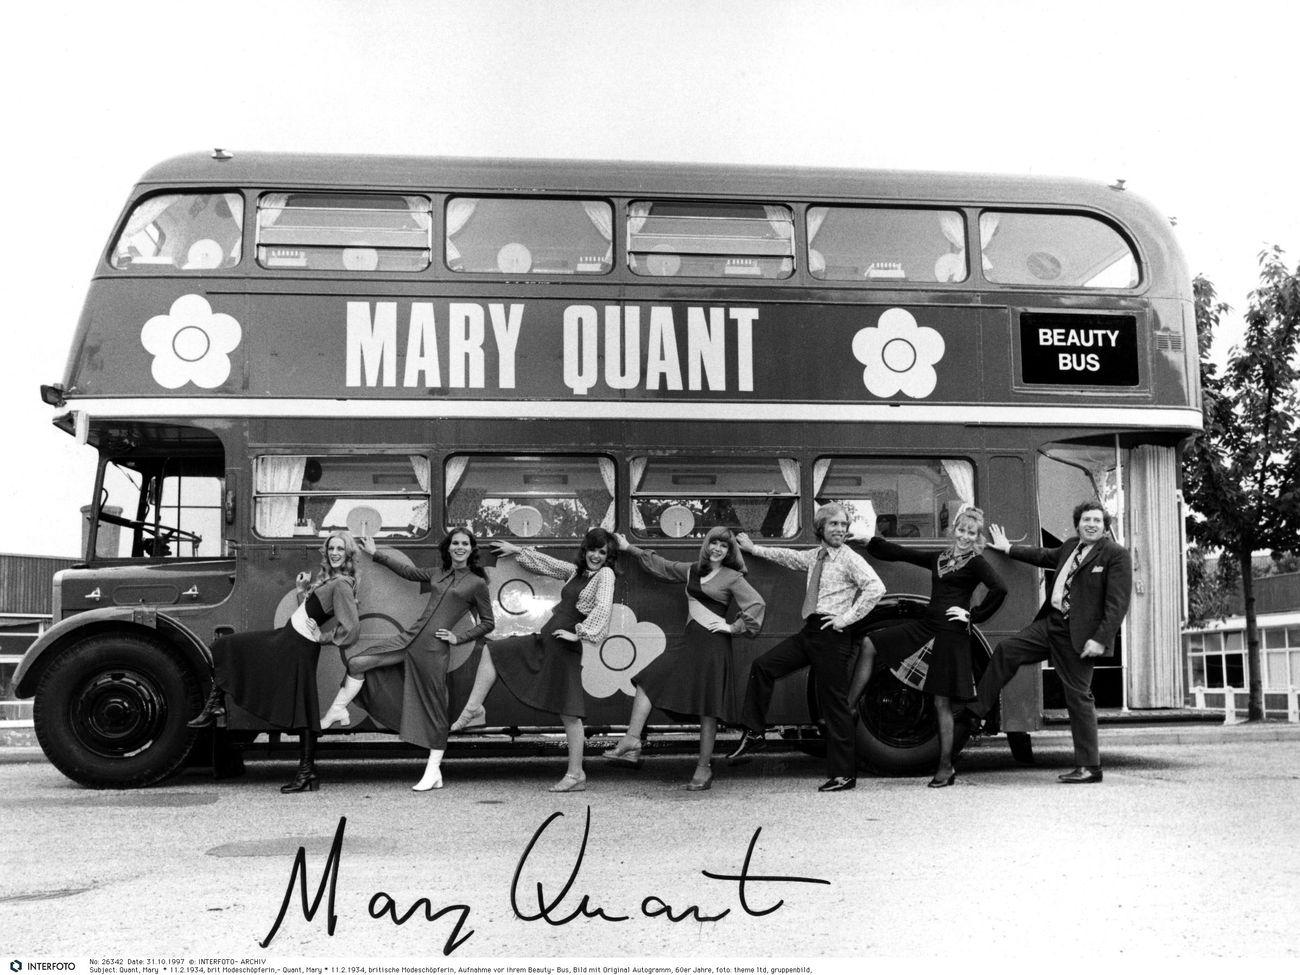 The Mary Quant Beauty bus, 1971. Image © INTERFOTO AlamyStock Photo